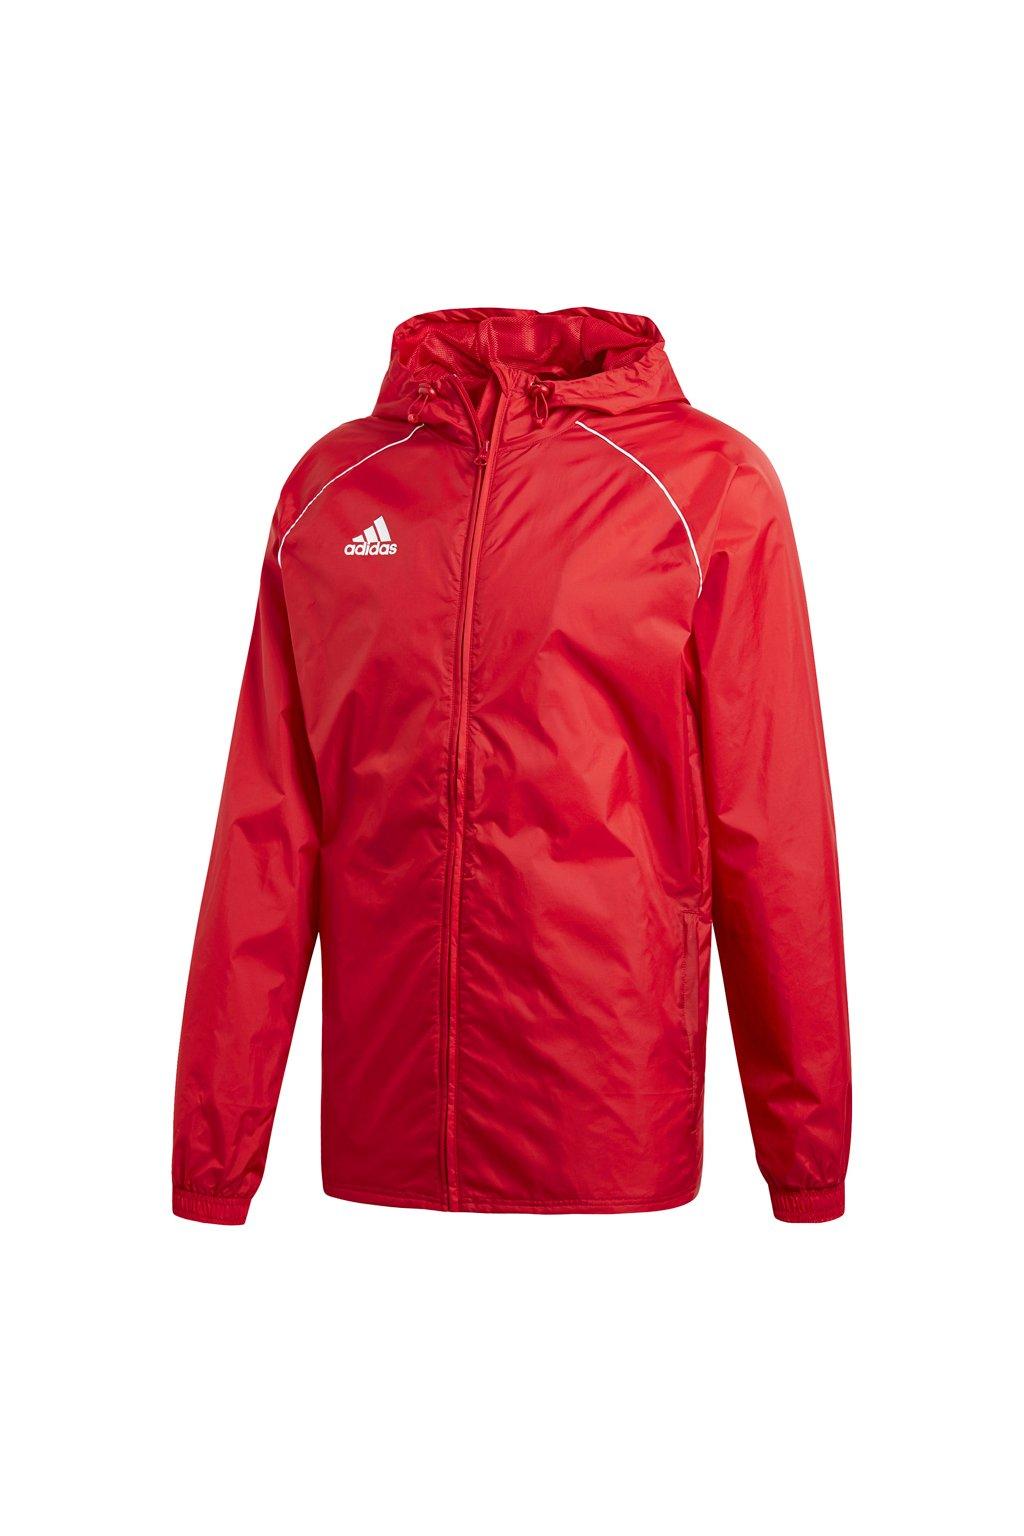 Pánska bunda Adidas Core 18 Rain red CV3695